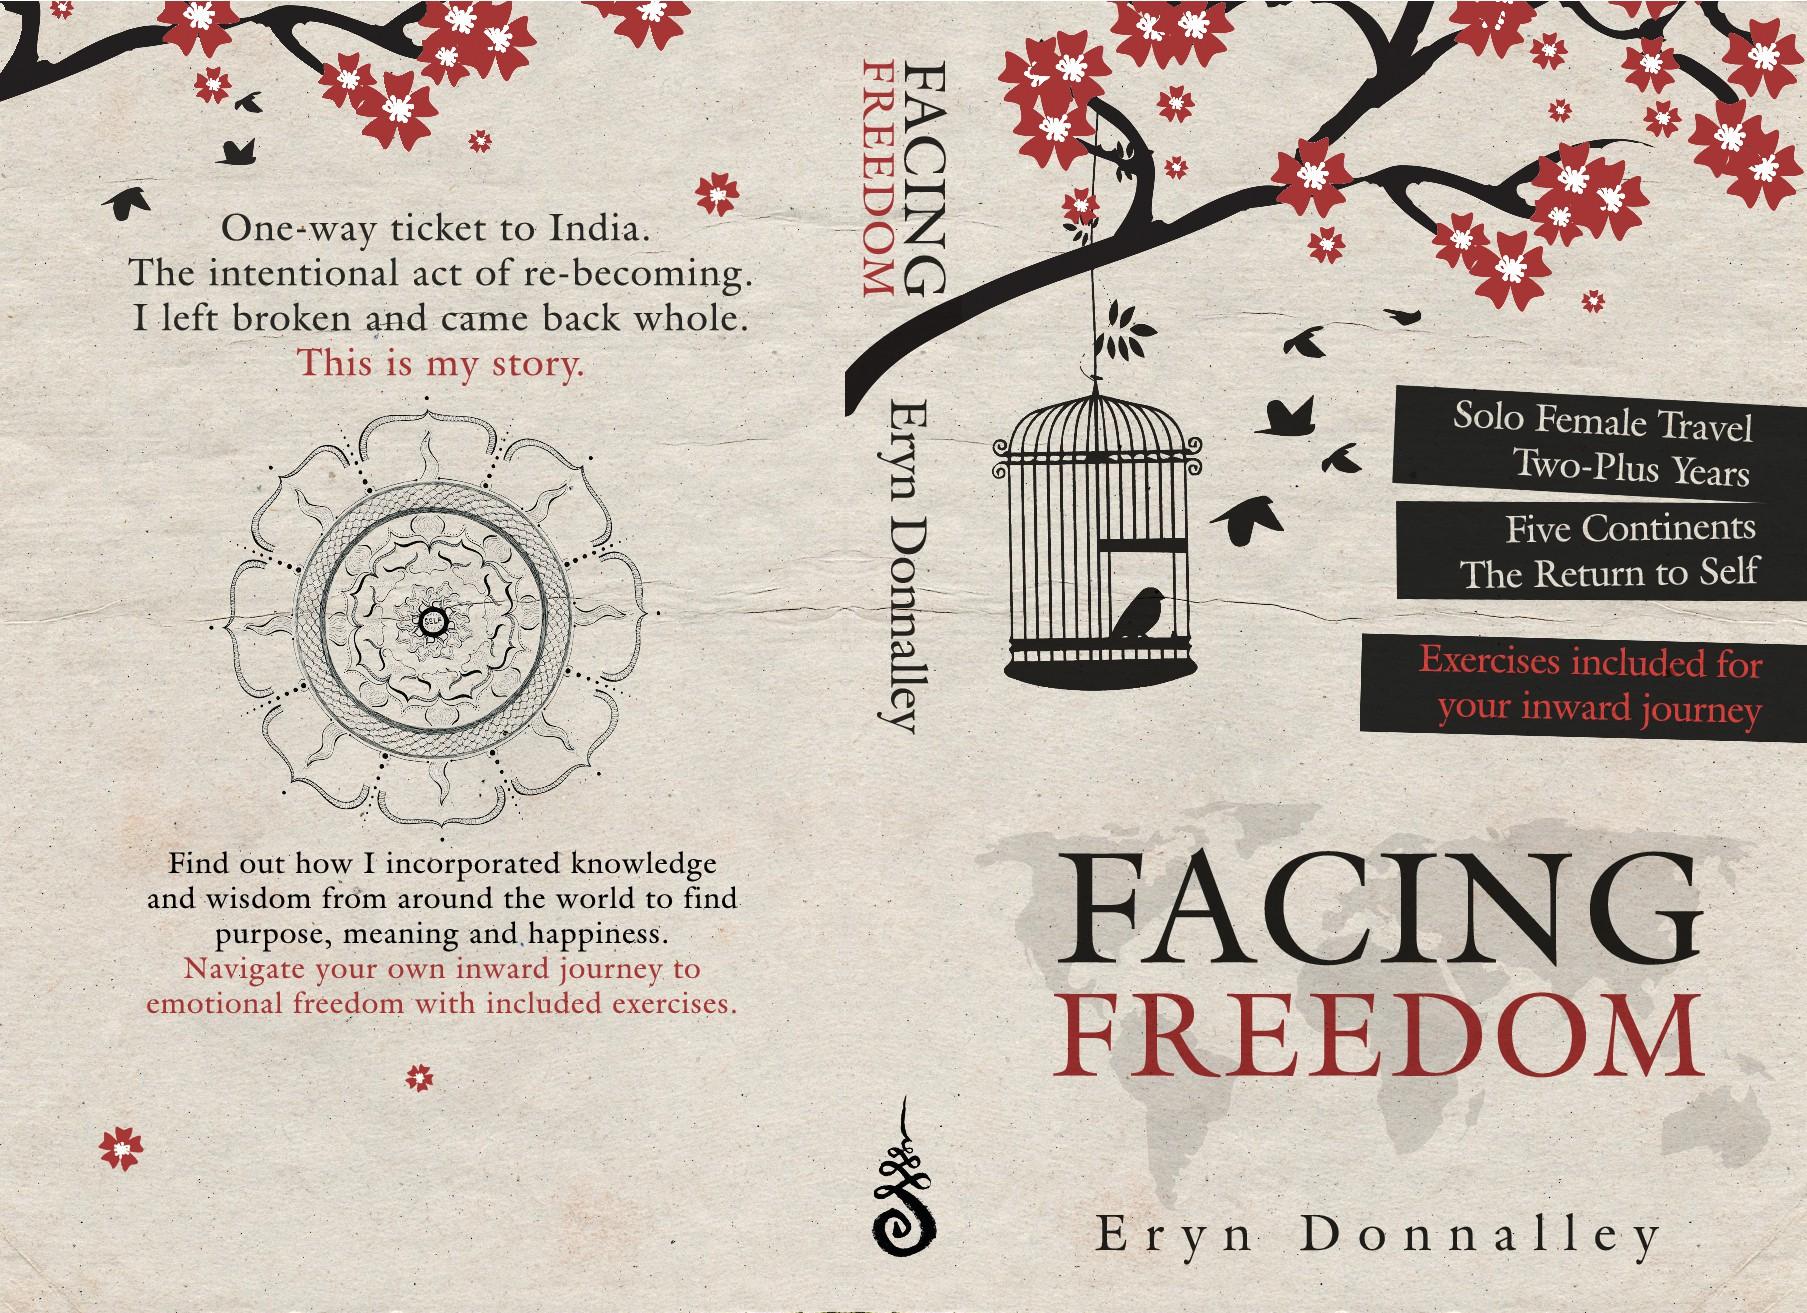 Design me a funky, artistic cover for a book to elevate consciousness